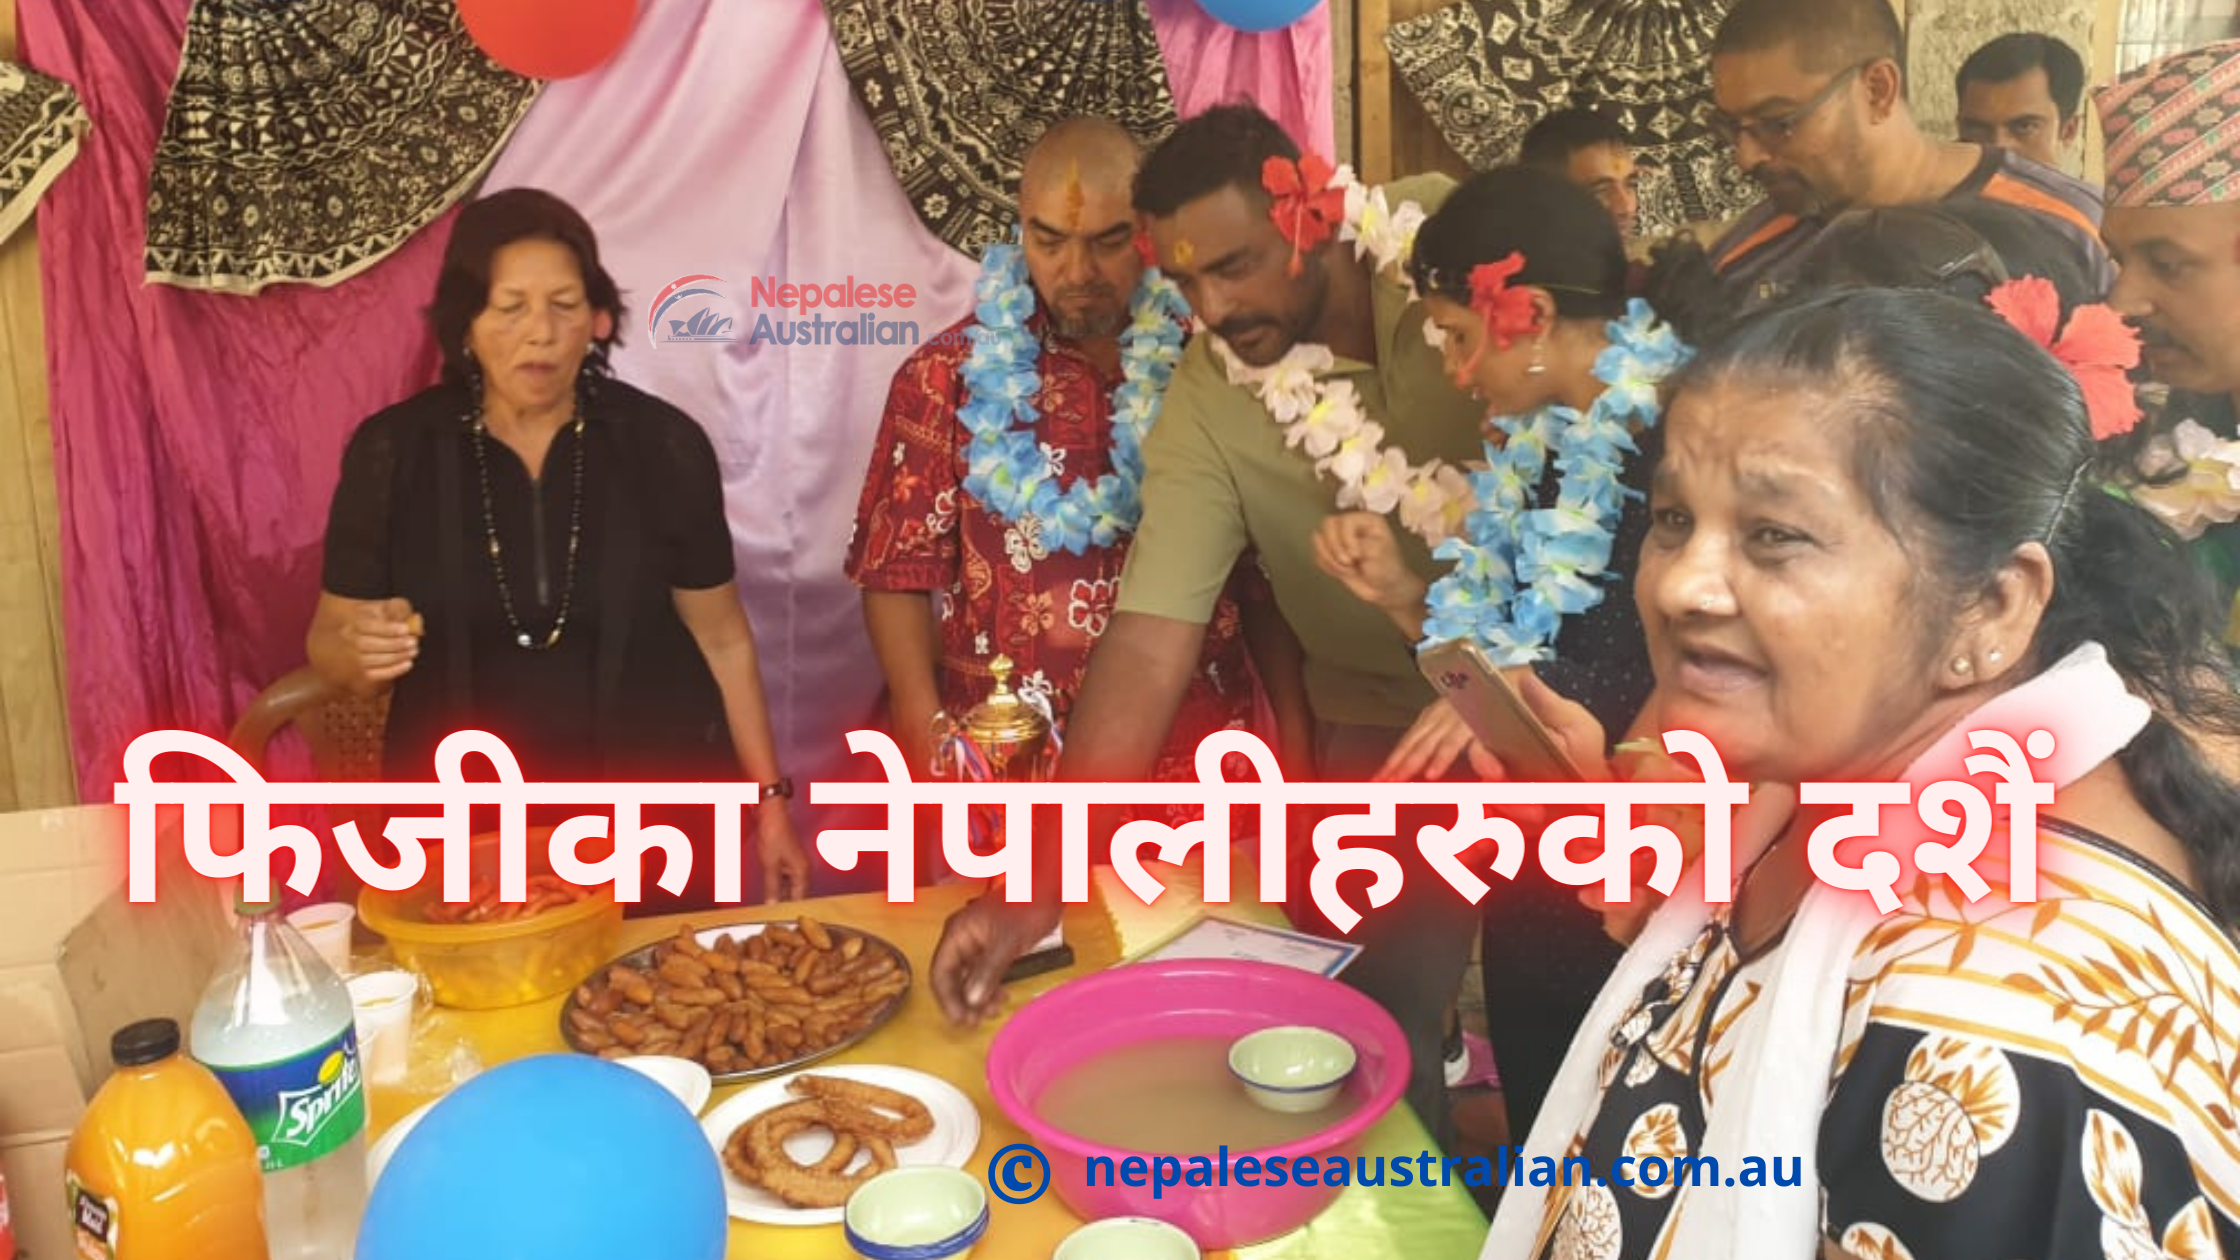 FIJI Nepalese Community Celebrate Dashain Festival